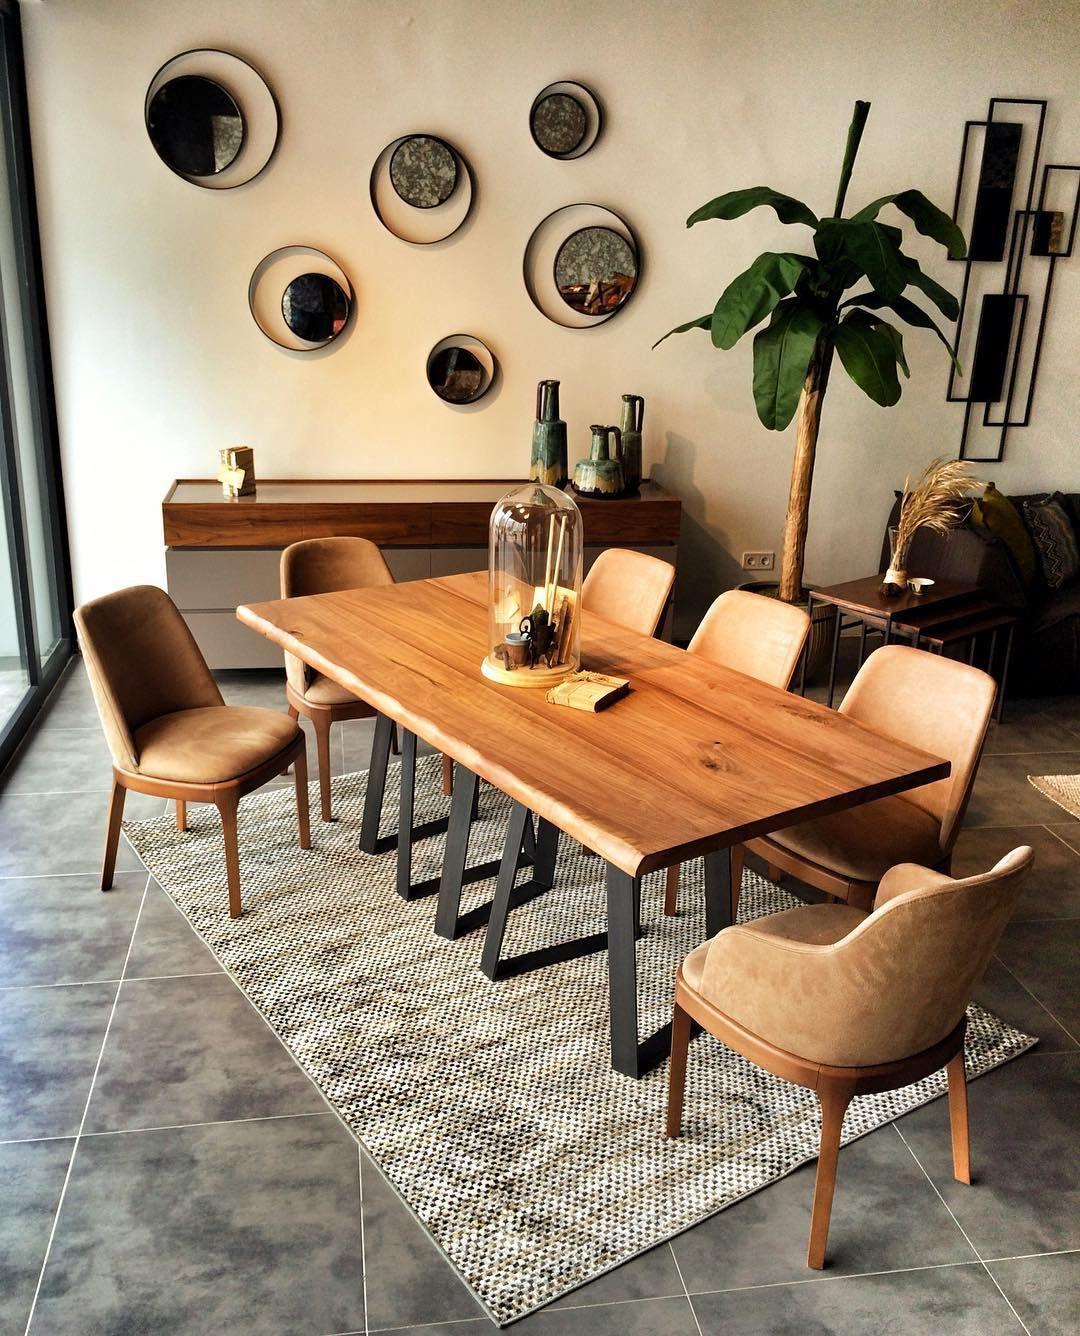 Instagram Post Von Fuga Furniture 6 Mai 2016 Um 13 03 Uhr Utc In 2020 Marmor Esstische Esstisch Vintage Haus Deko